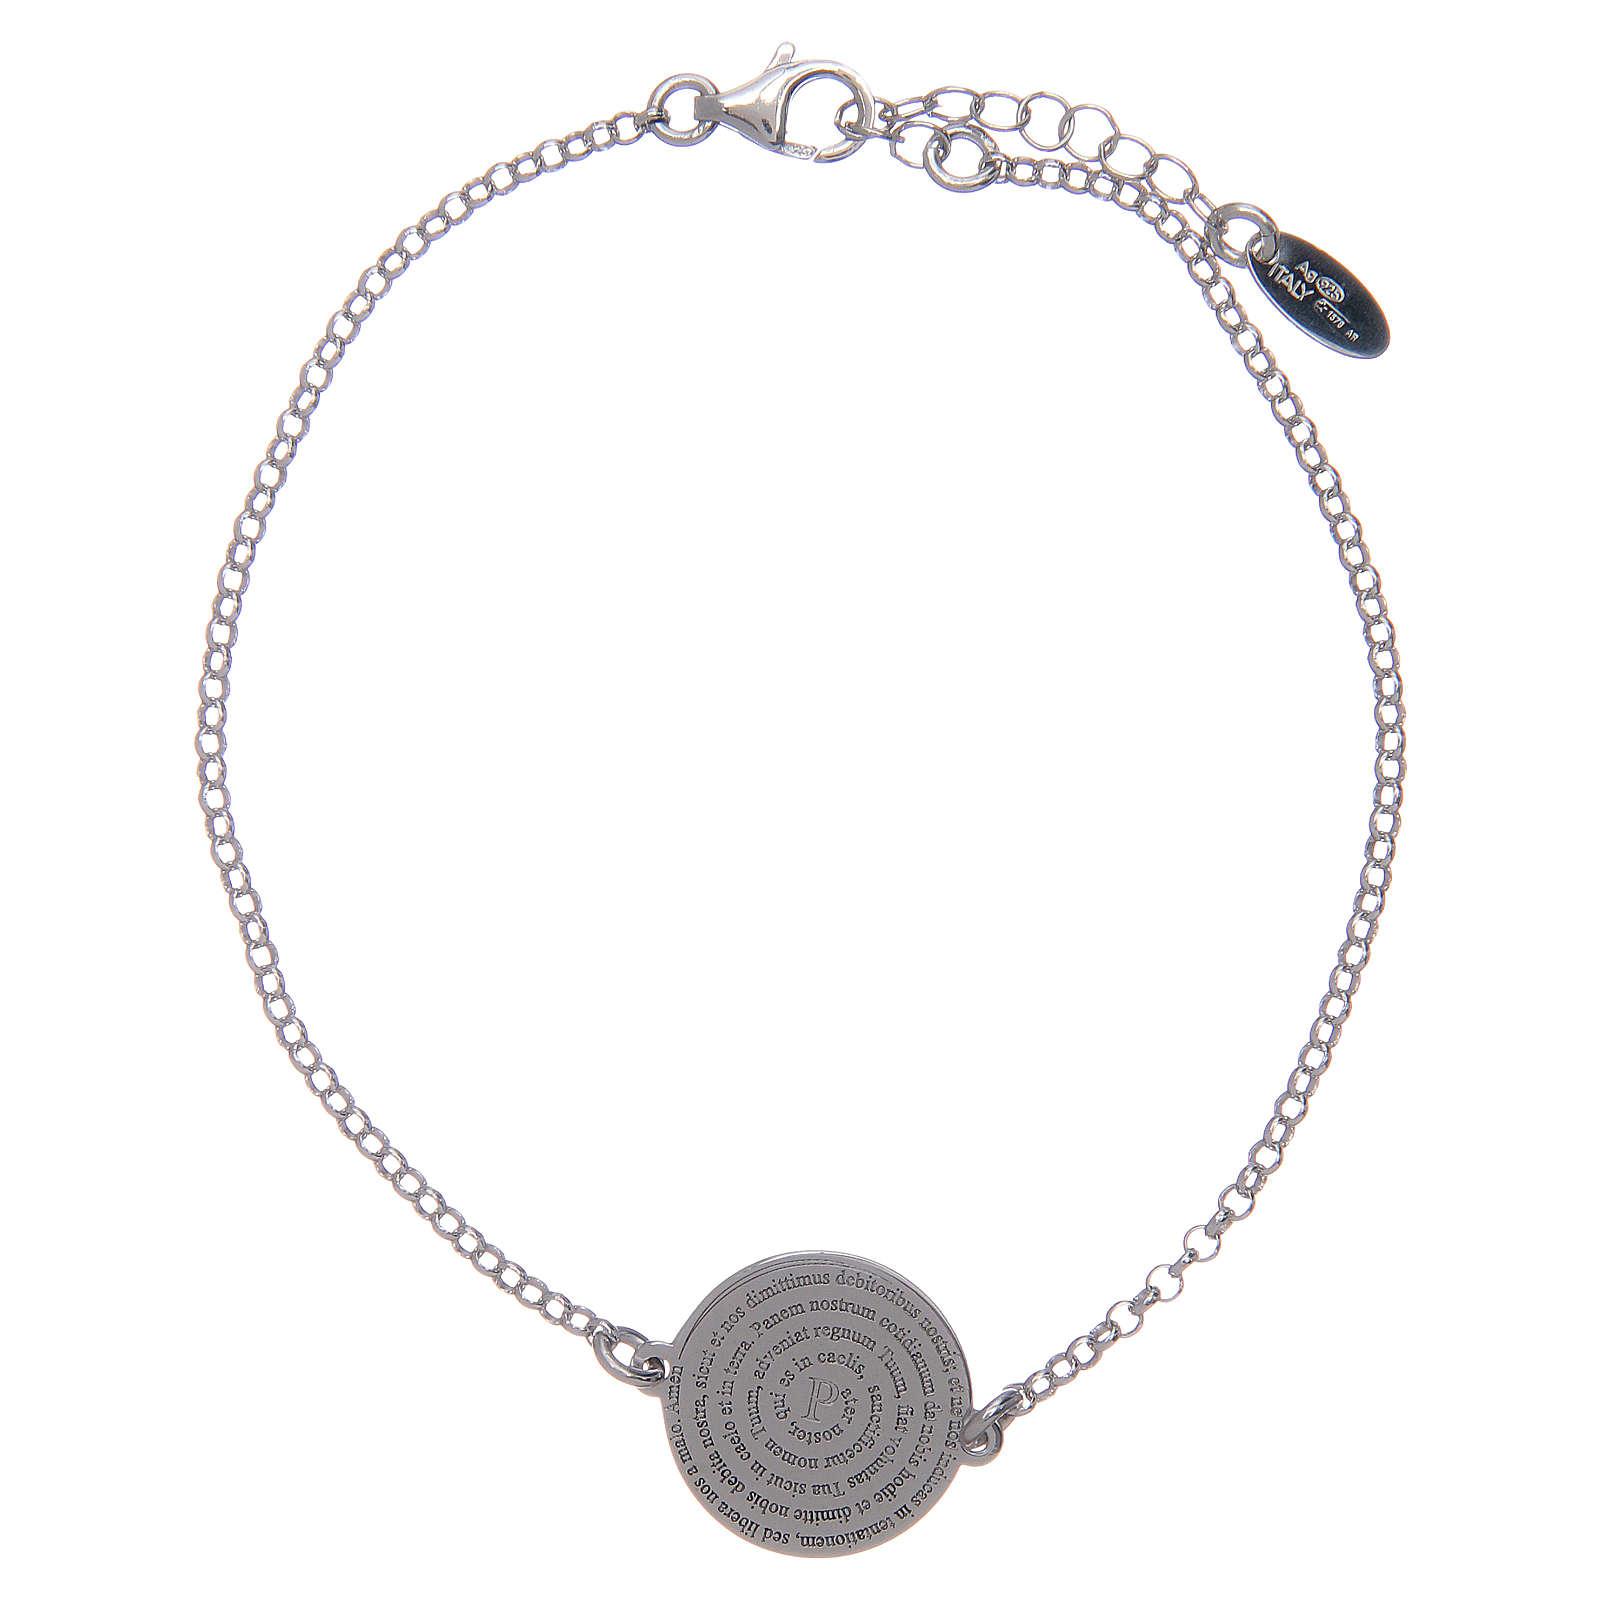 Amen-Armband Silber 925 lateinisch Vaterunser 4